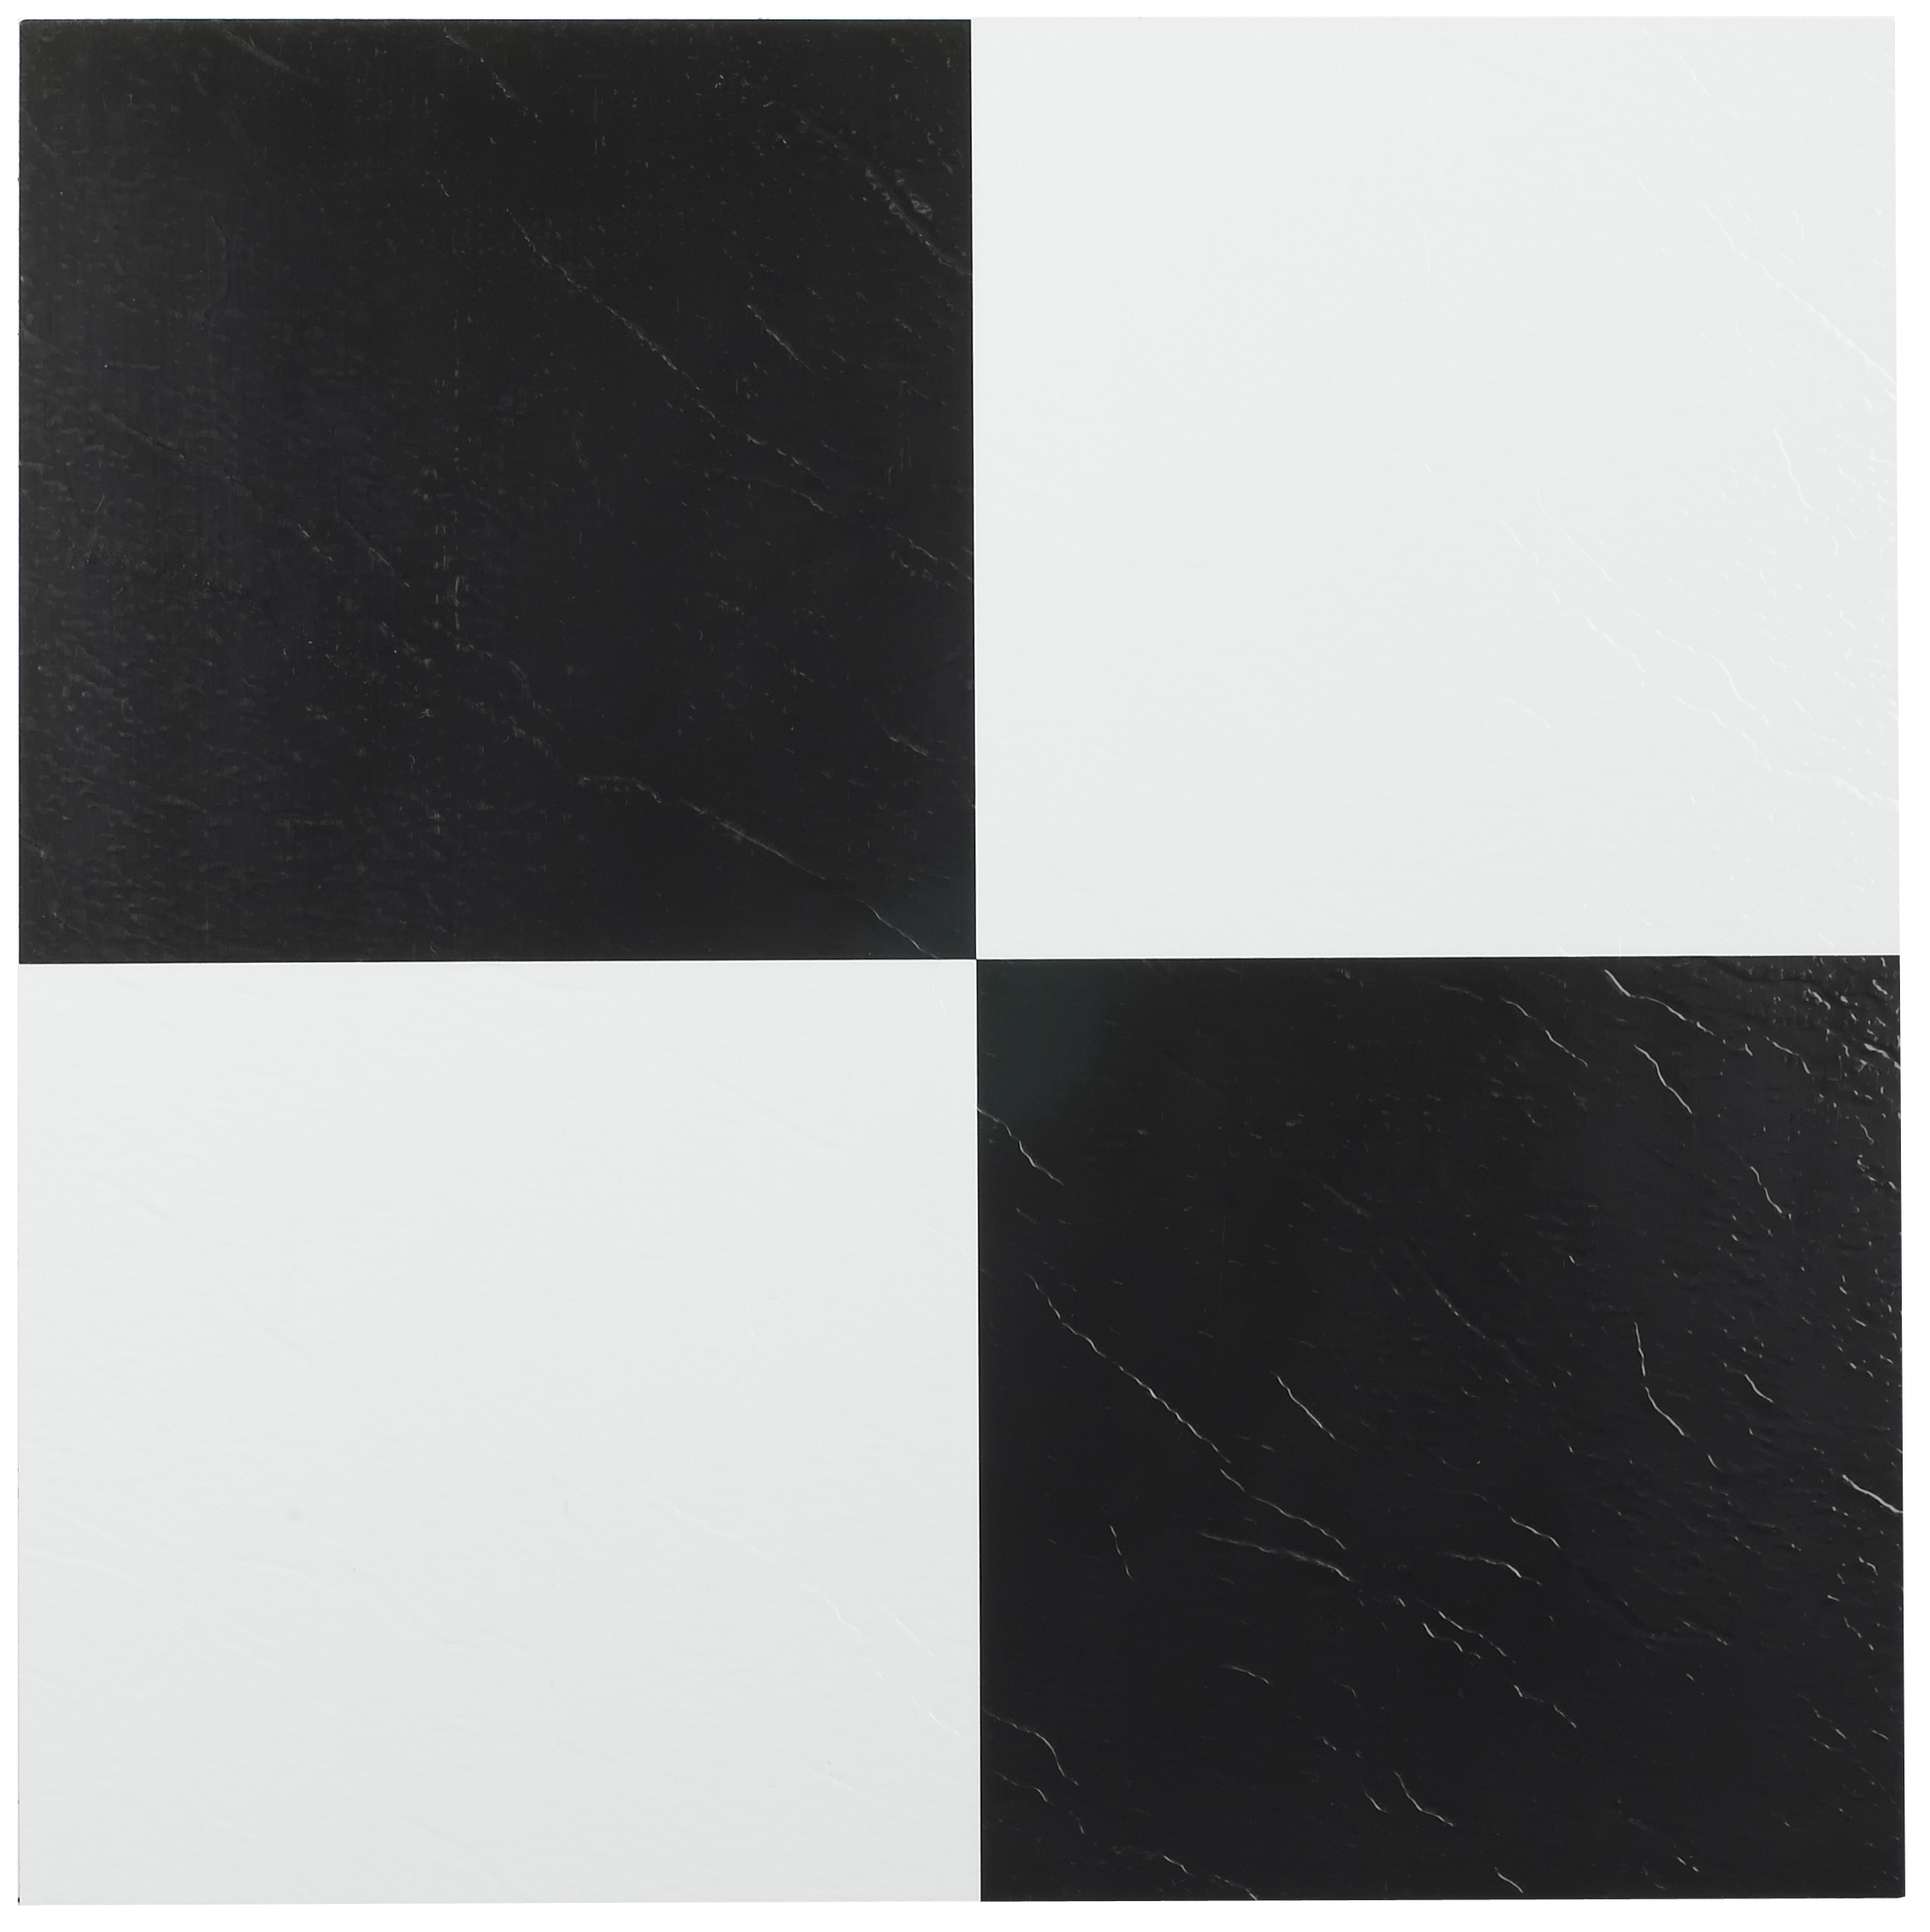 Achim Tivoli Black White 12 Inch X 12 Inch Self Adhesive Vinyl Floor Tile 103 45 Tiles Vinyl Flooring Vinyl Tile Self Adhesive Floor Tiles